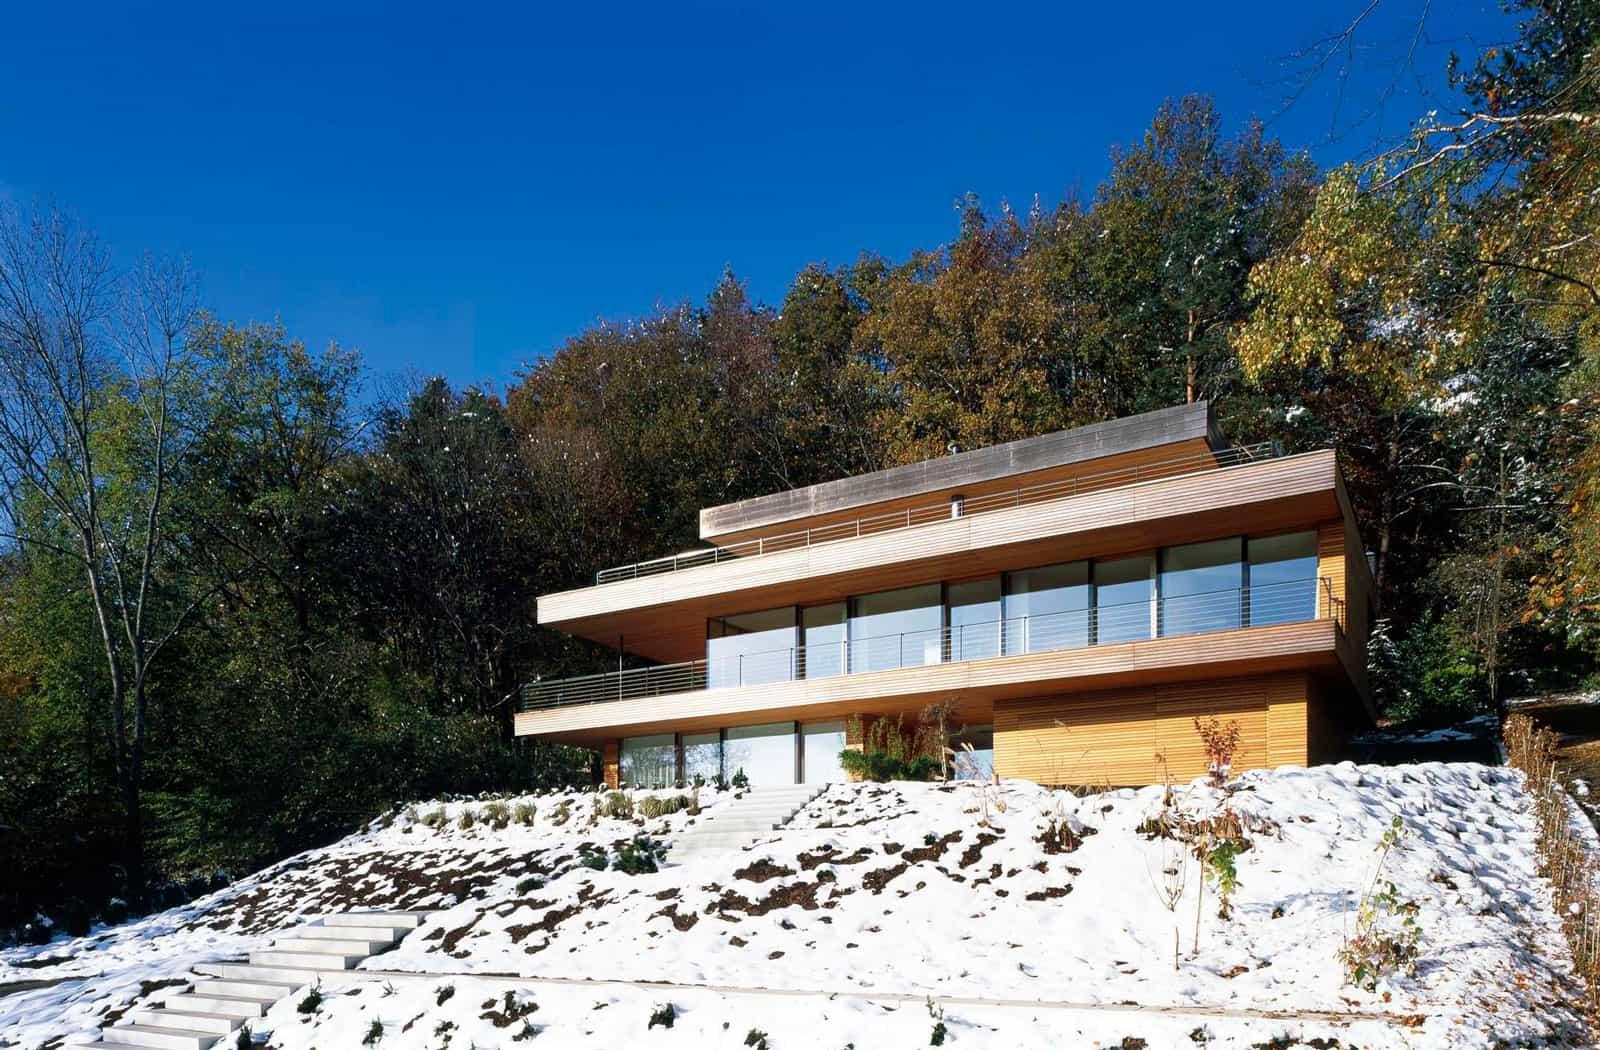 House Heilbronn by k m architektur (4)